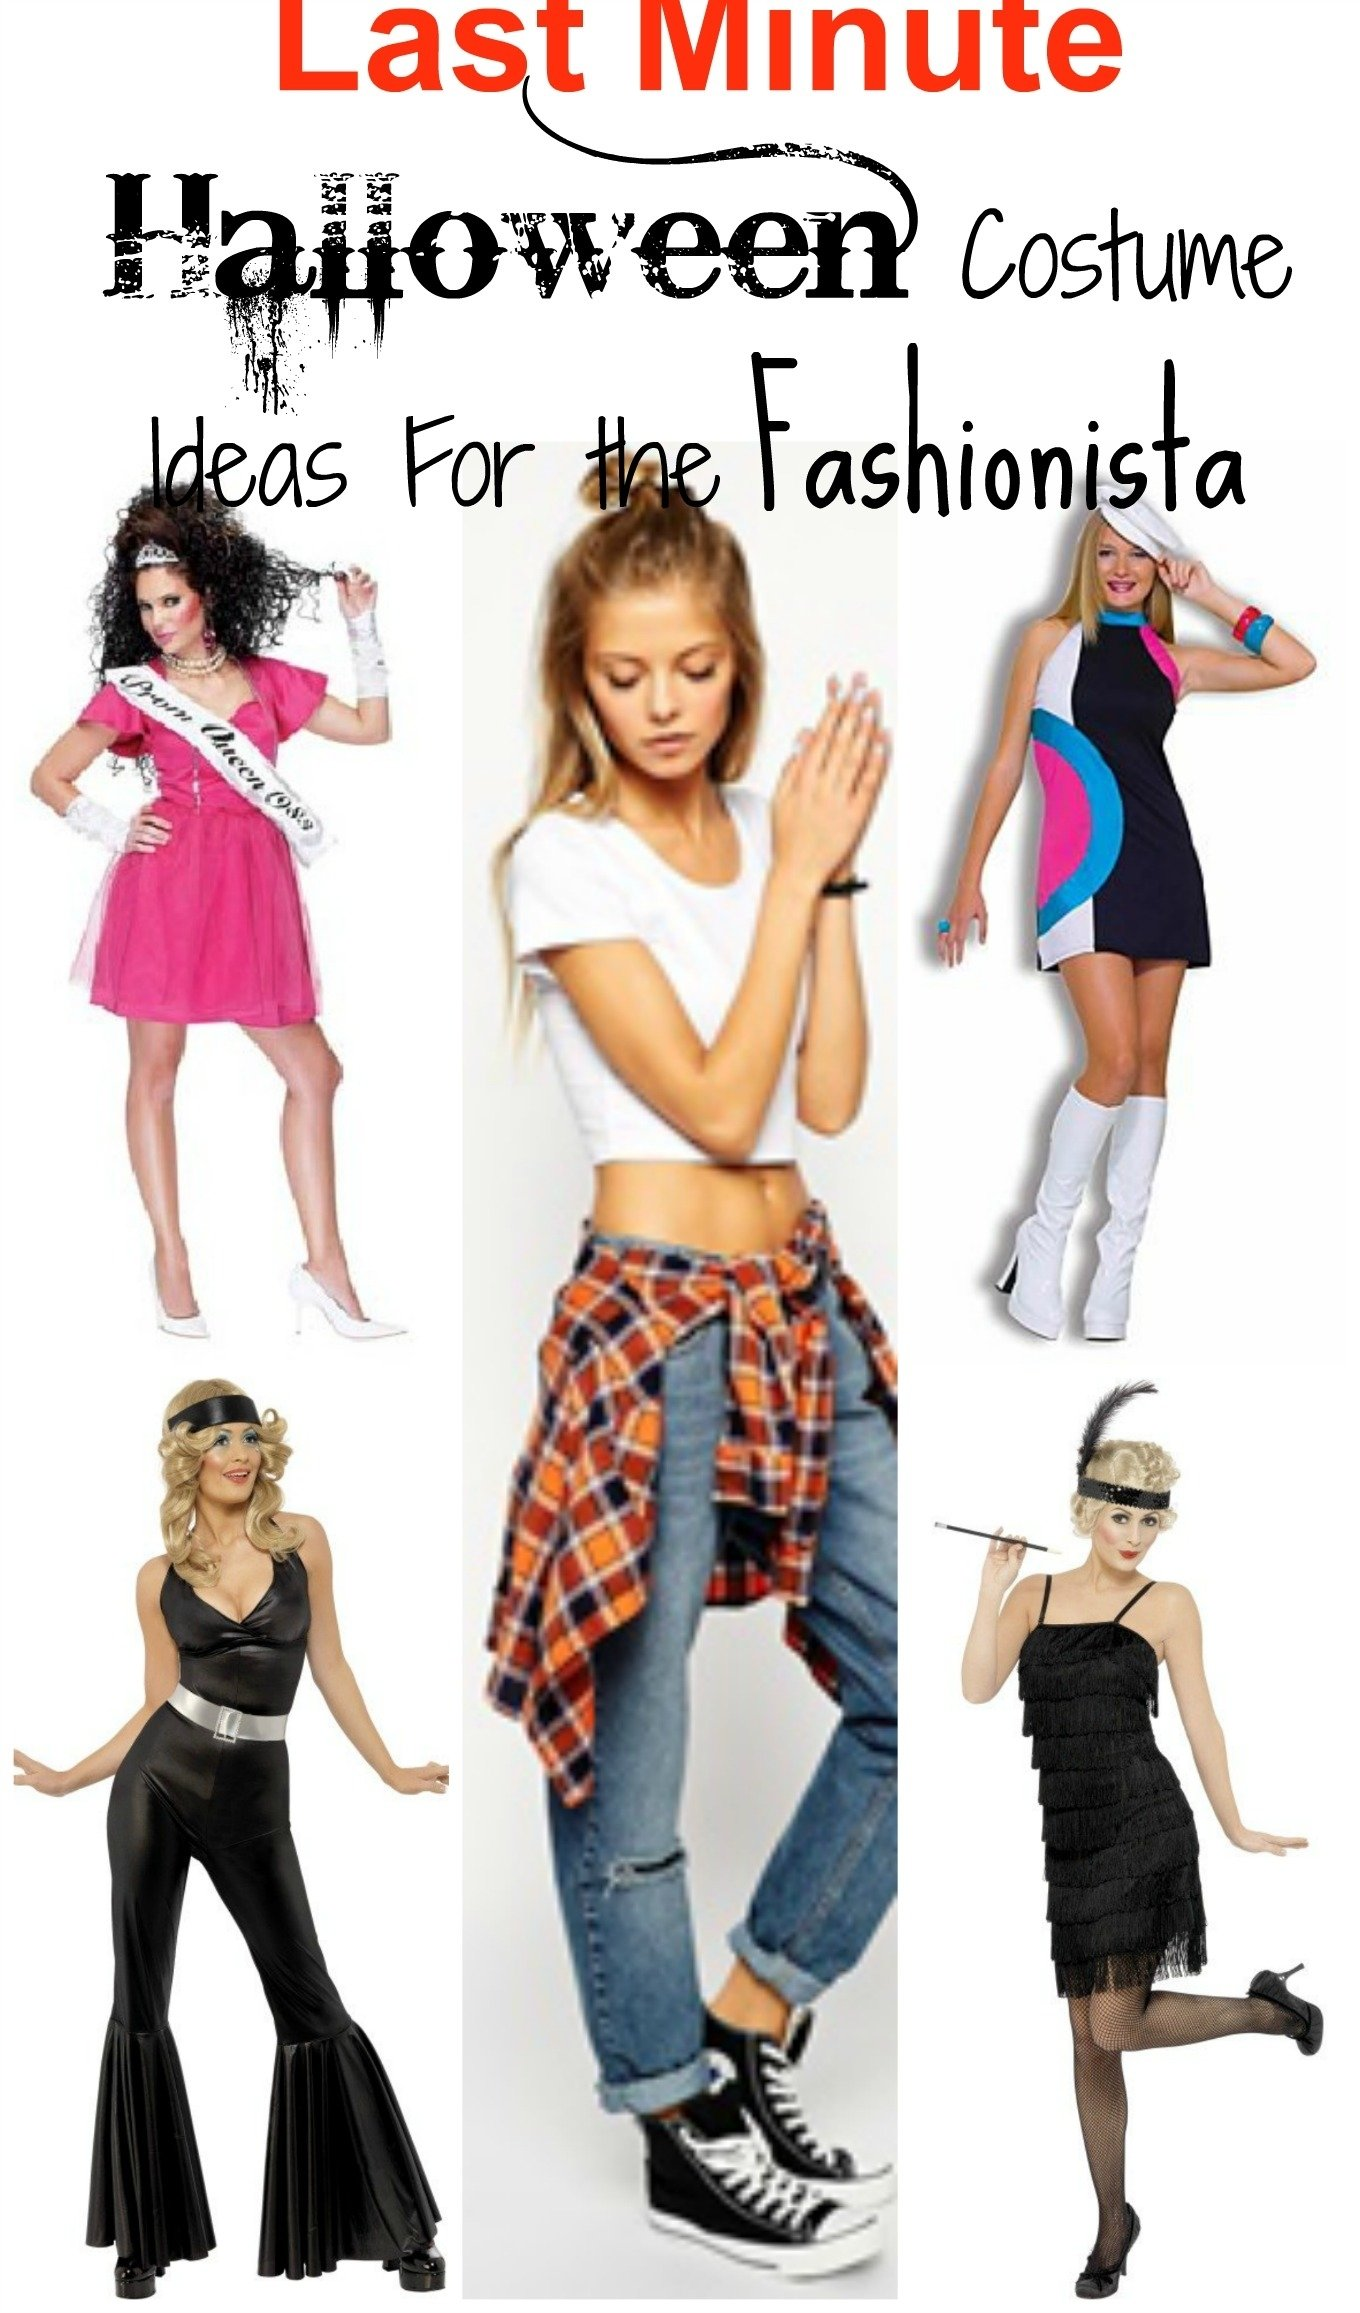 10 Attractive Last Minute Easy Costume Ideas 5 last minute halloween costume ideas for the fashionista 1 2020